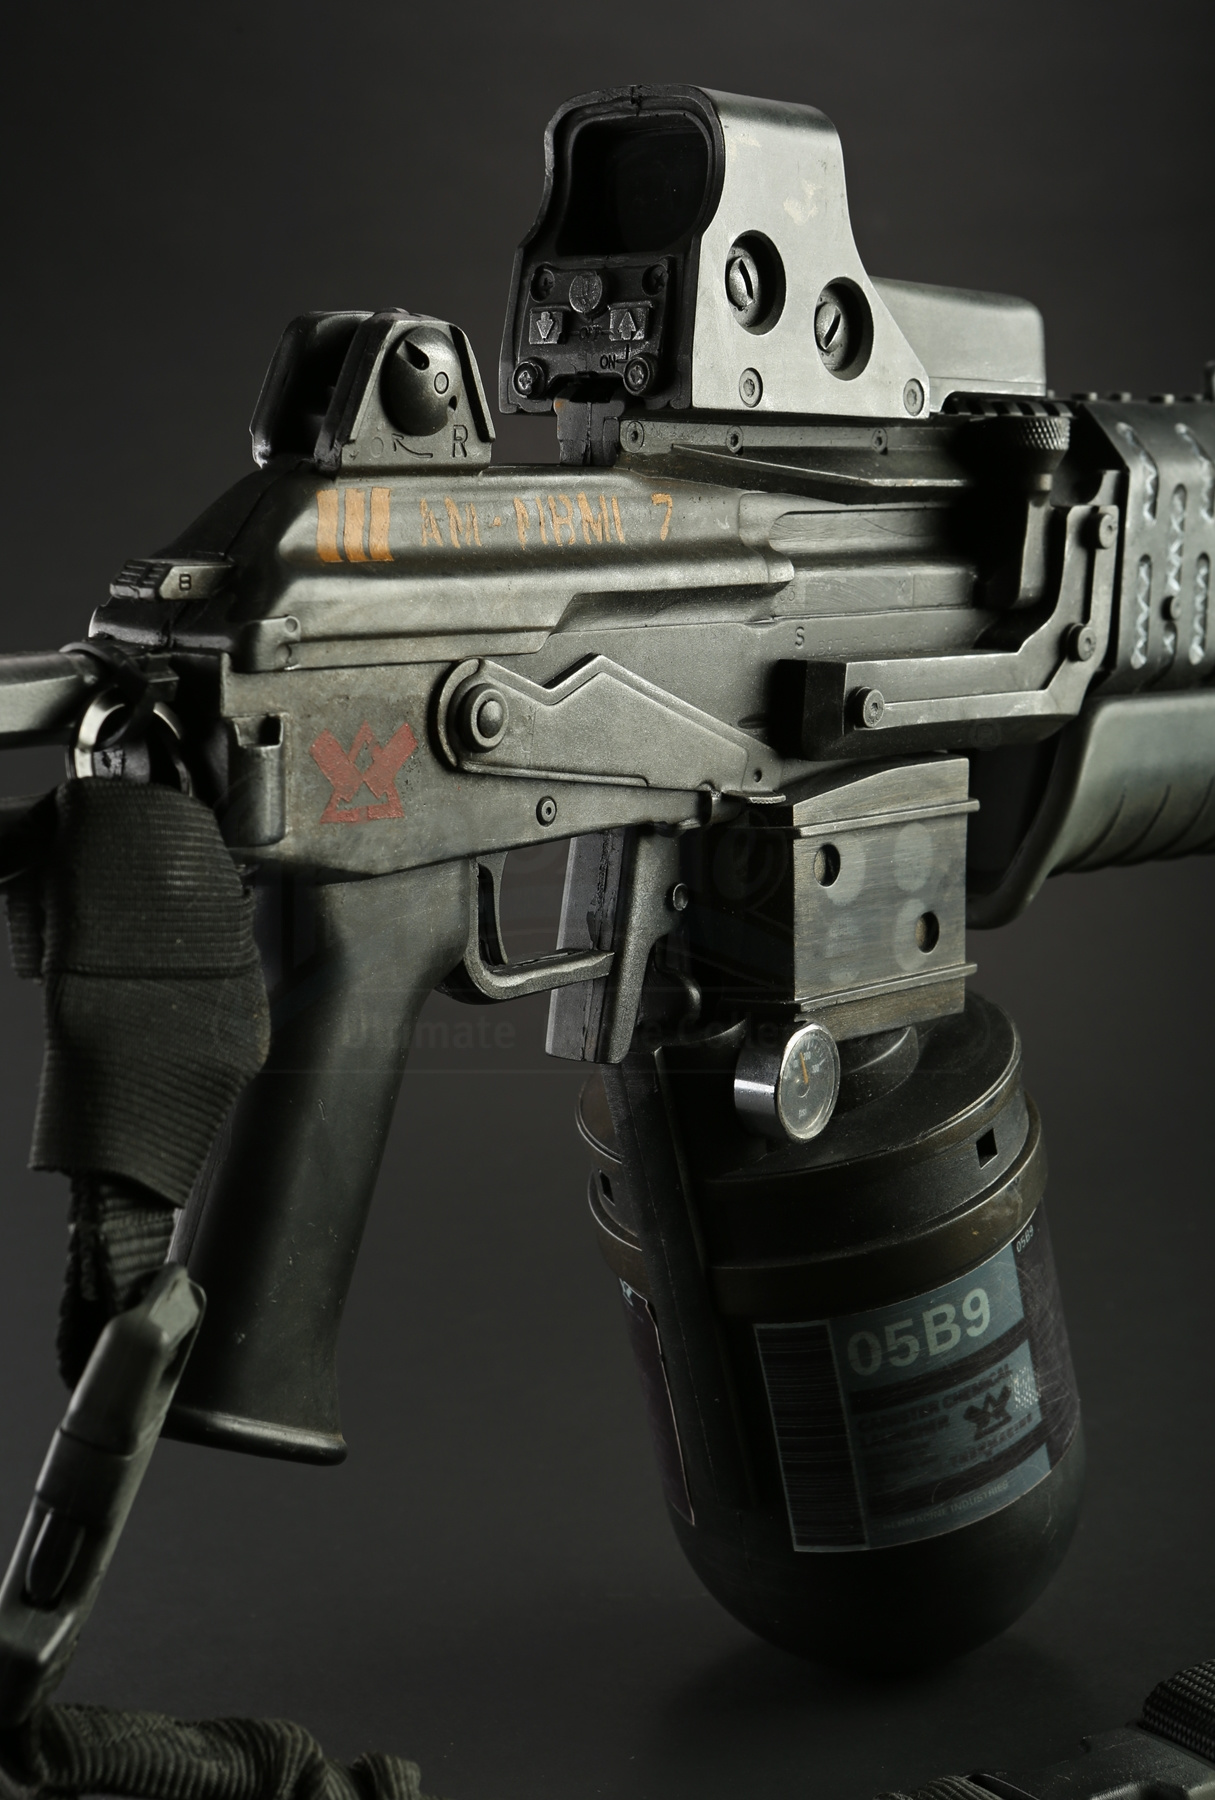 Terminator Genisys: Future Guerrilla Plasma Gun - Current ...